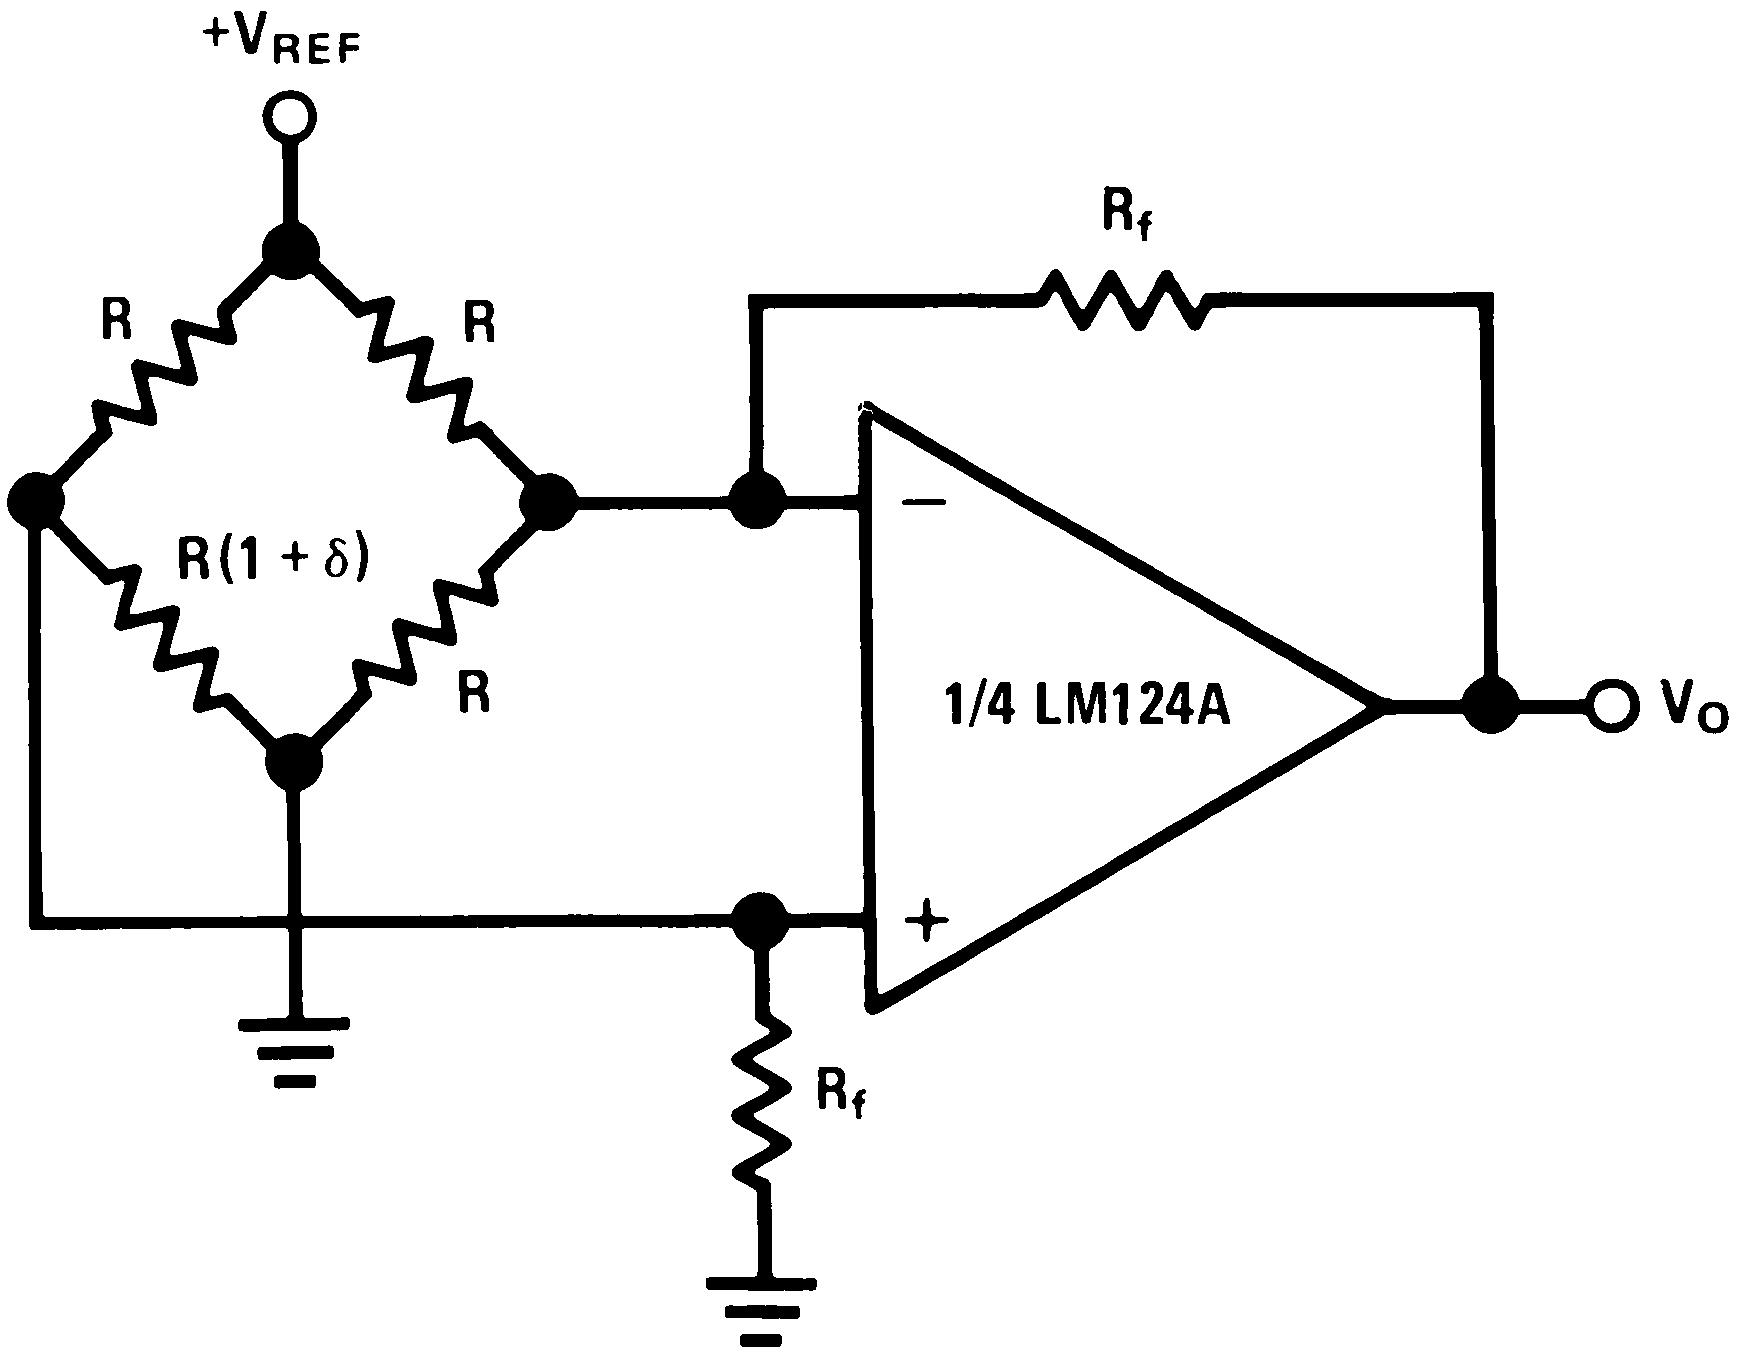 lm224